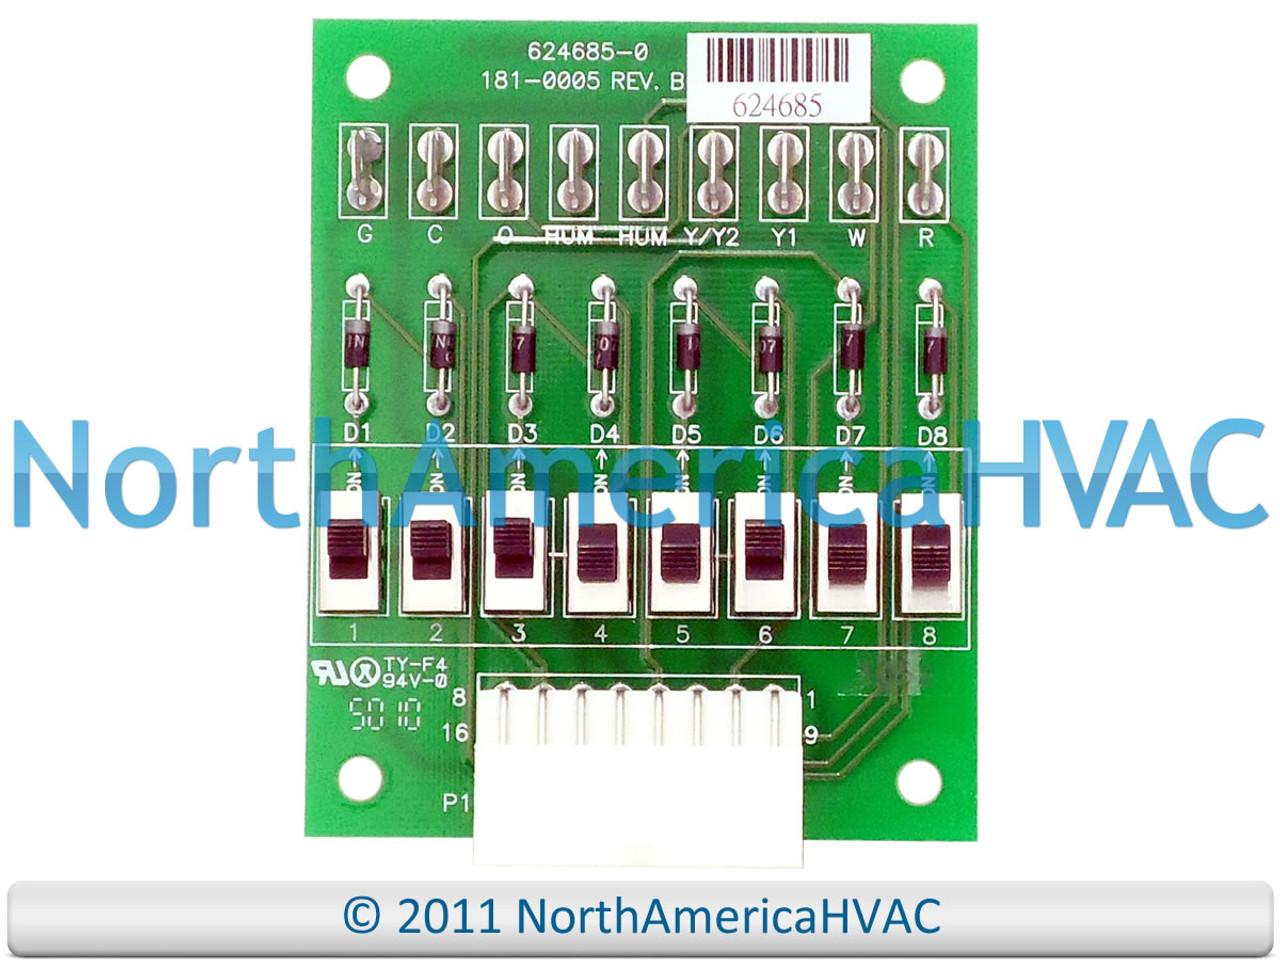 Nordyne Tappan Maytag OEM Furnace Control Circuit Board 624685-0 624685